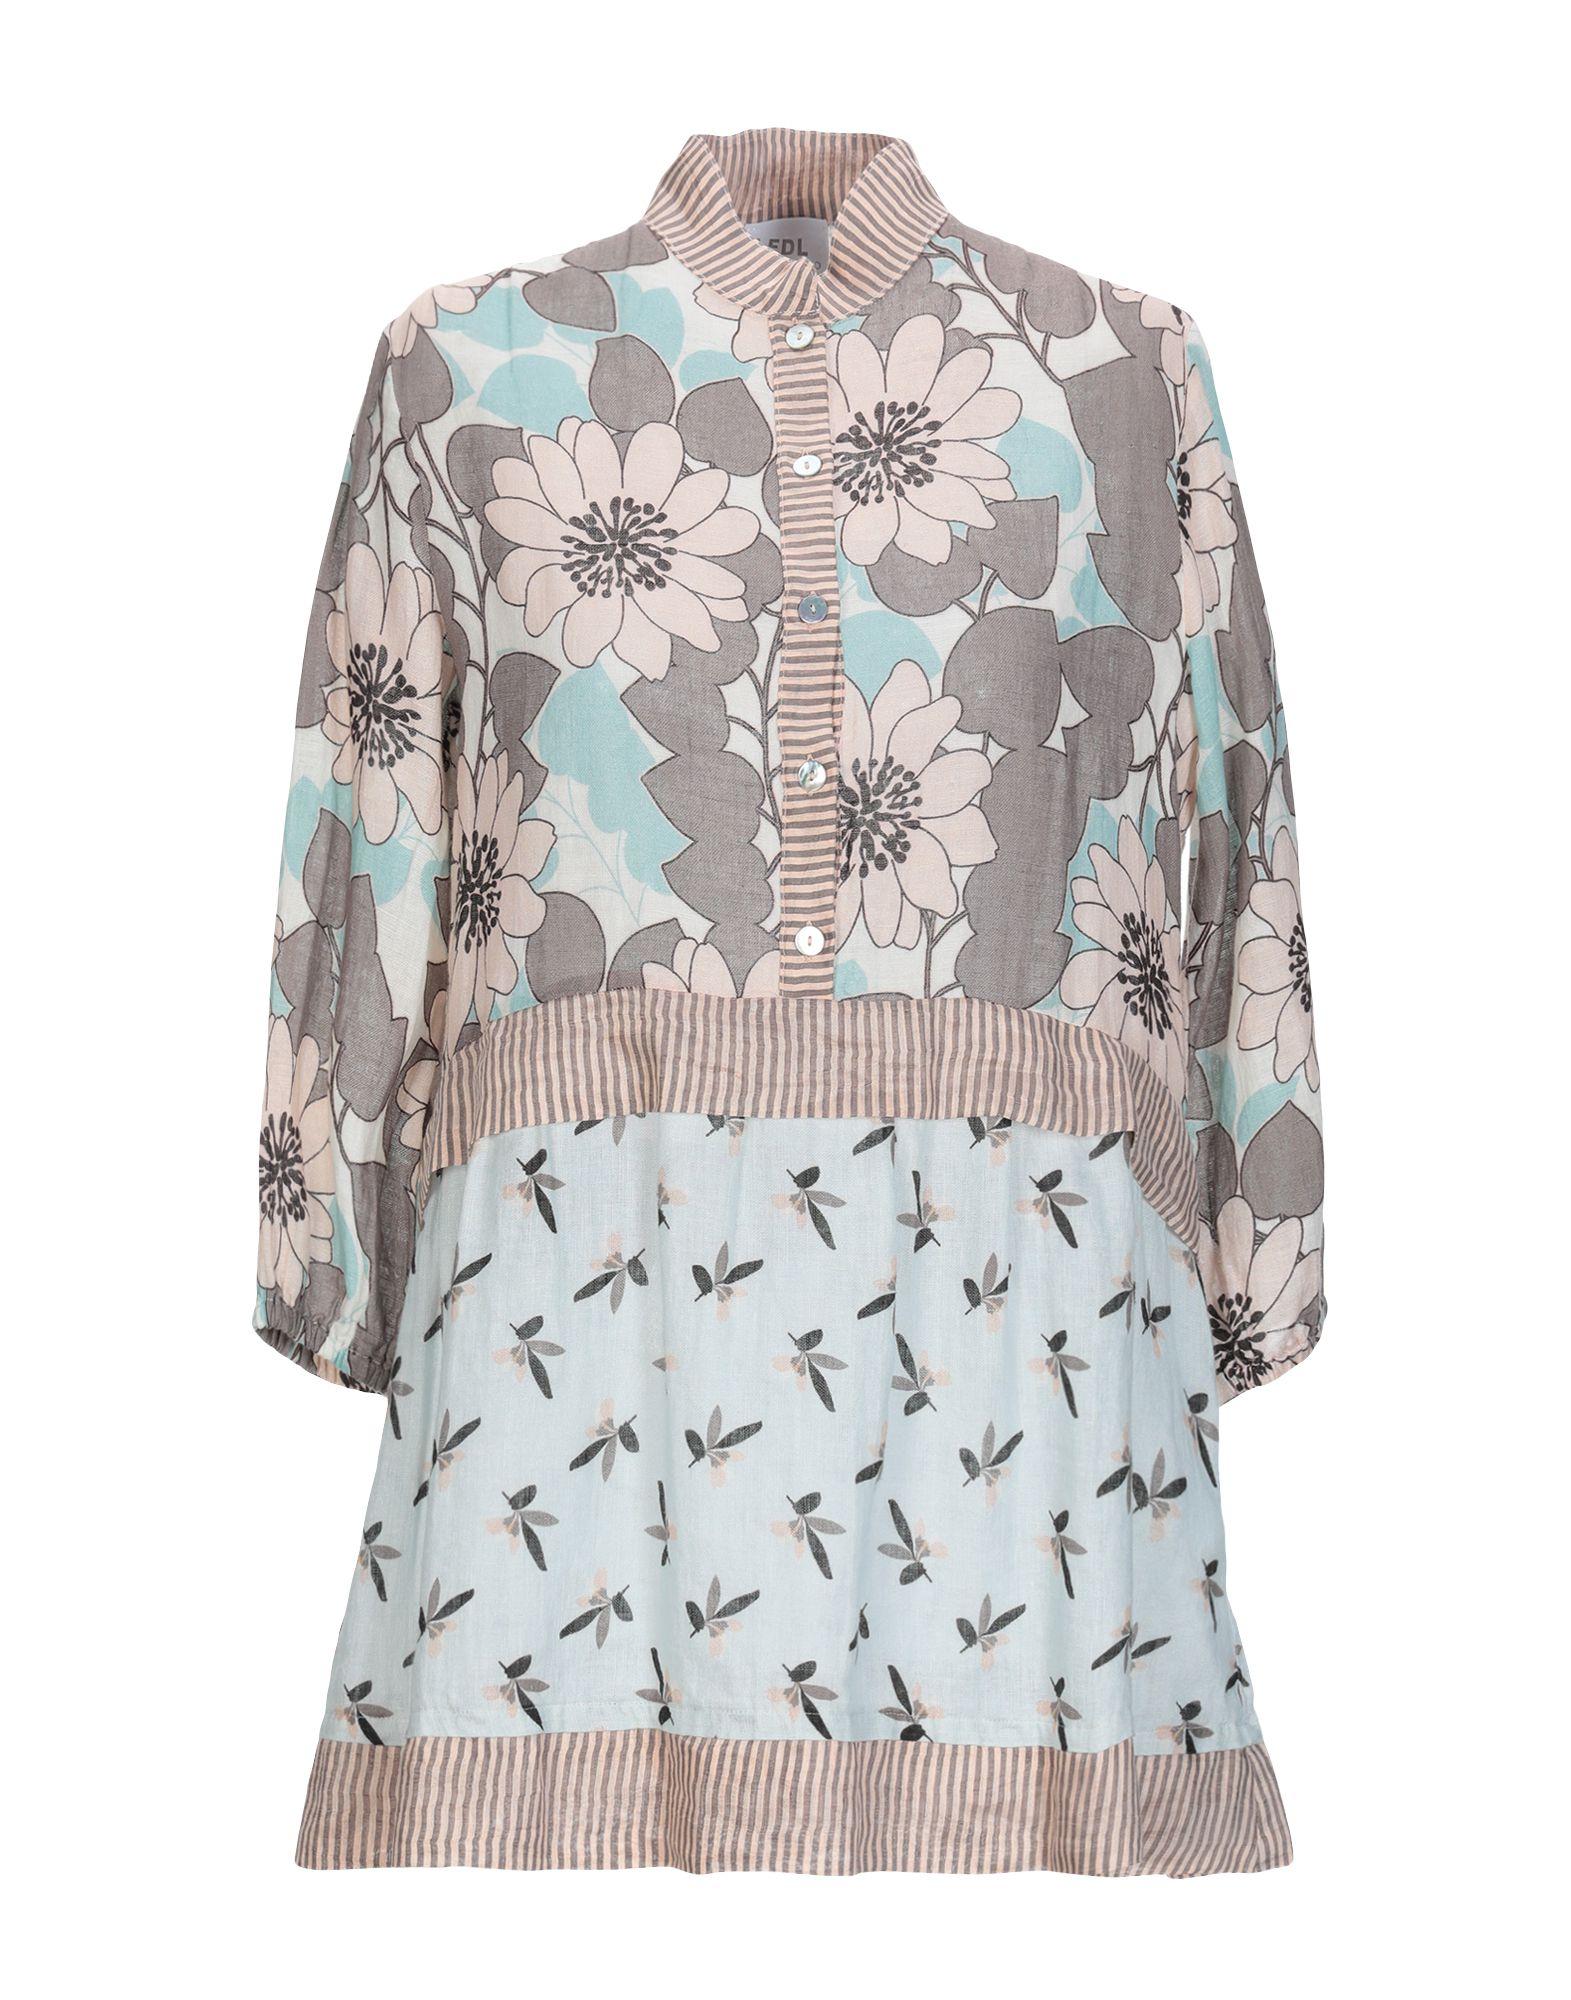 LA FABBRICA del LINO Блузка блузка женская la via estelar цвет зеленый 33951 размер 52